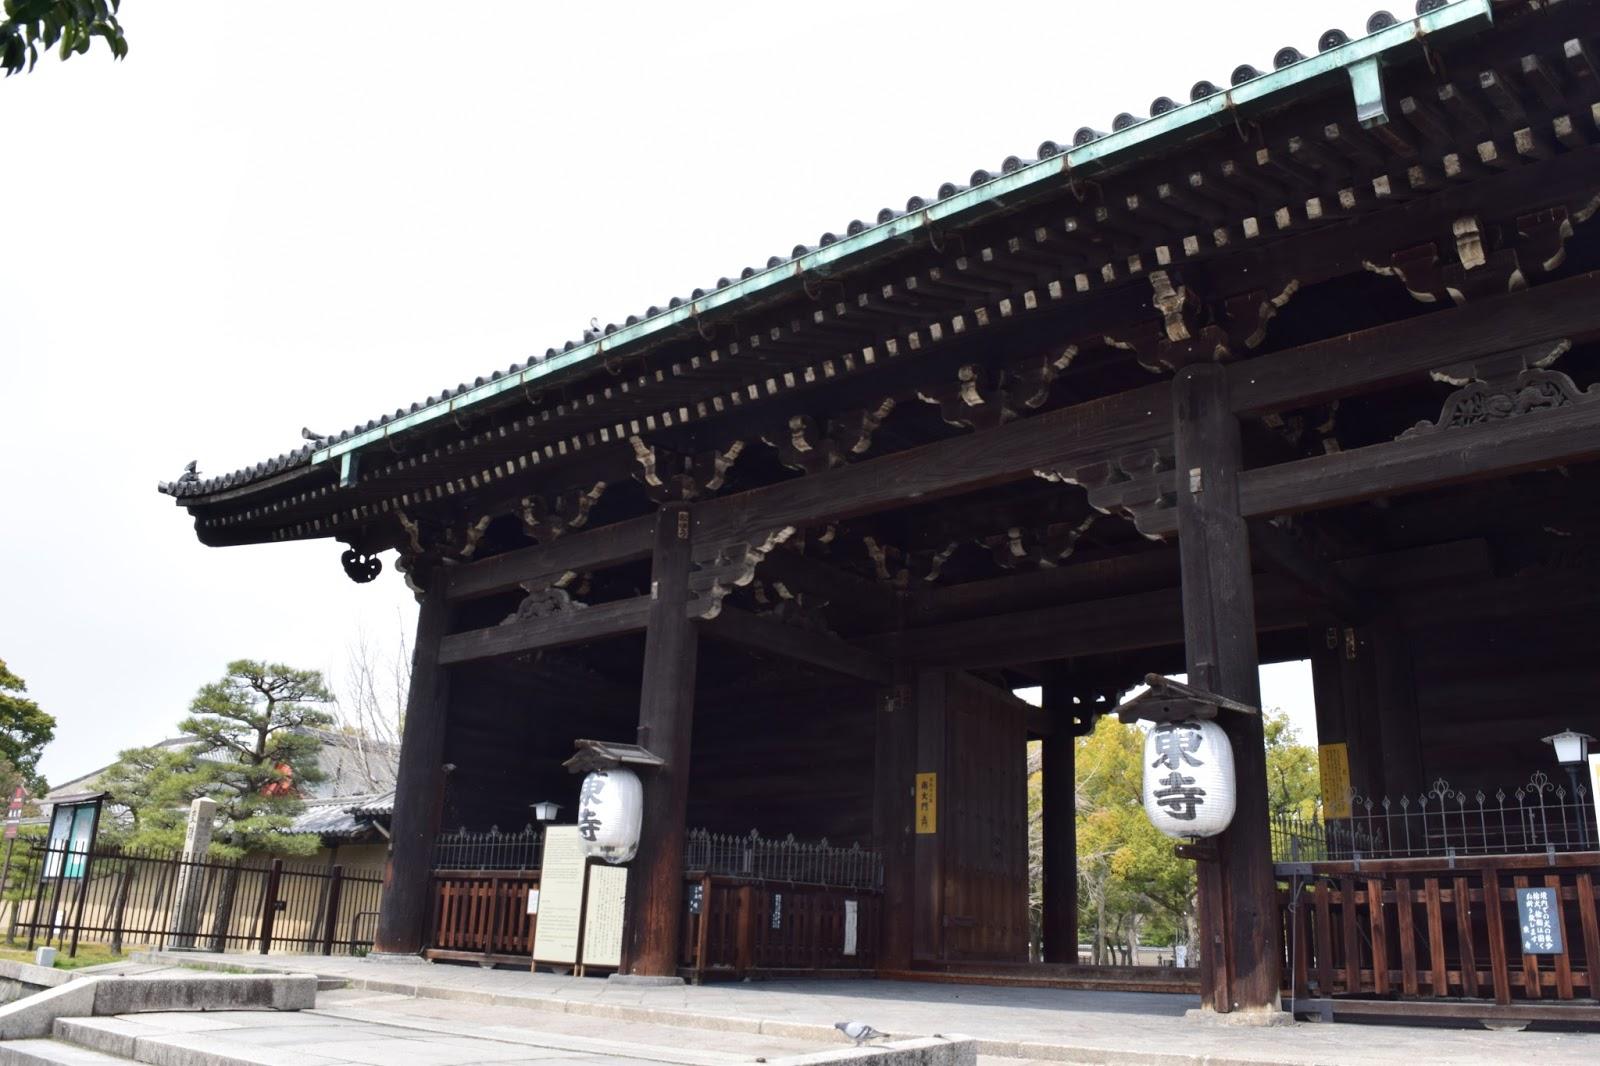 Toji front gate